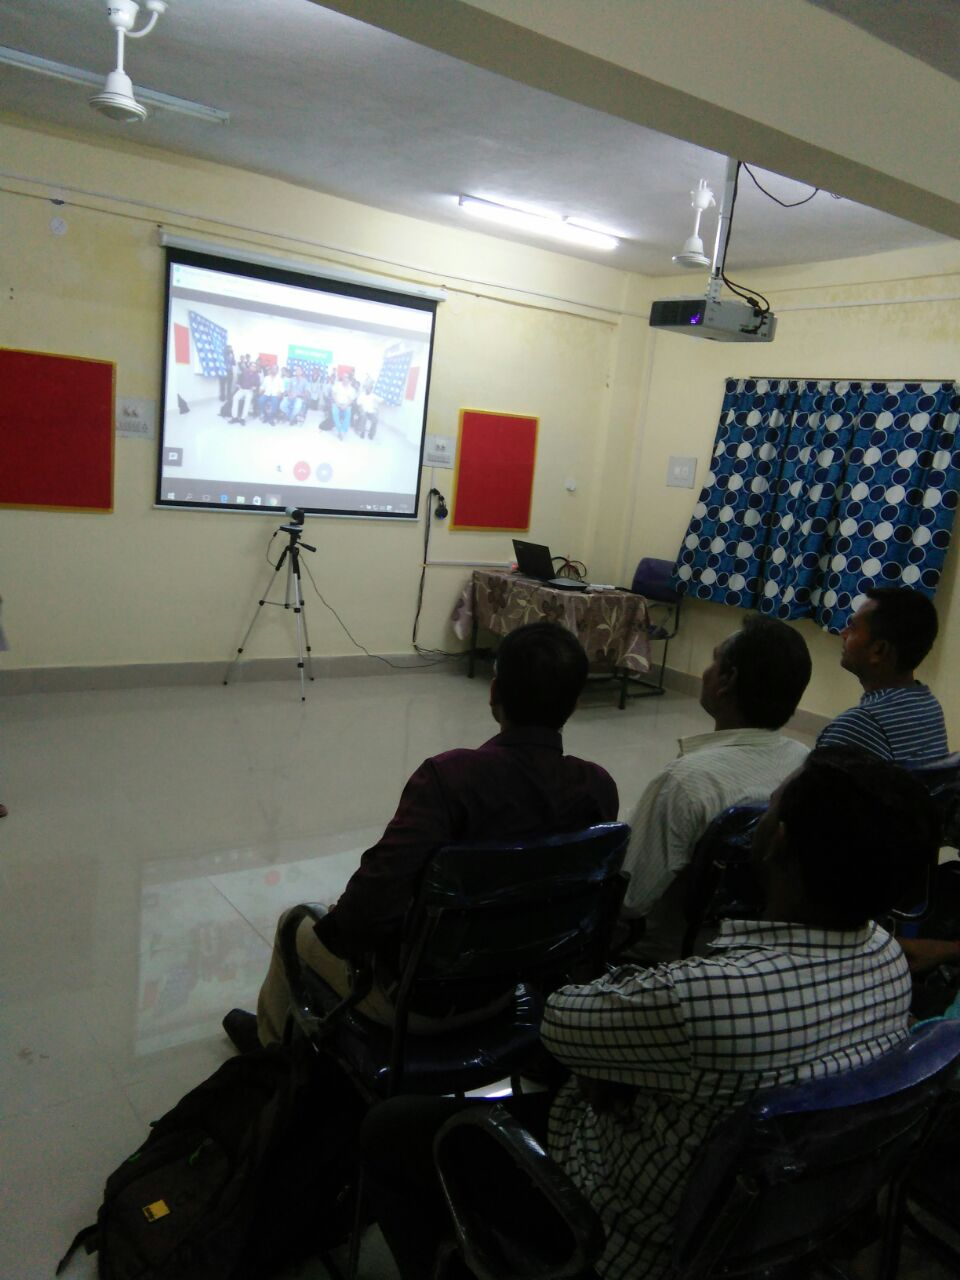 http://govpolytechgajapati.org/wp-content/uploads/2017/03/IMG-20170327-WA0001.jpg